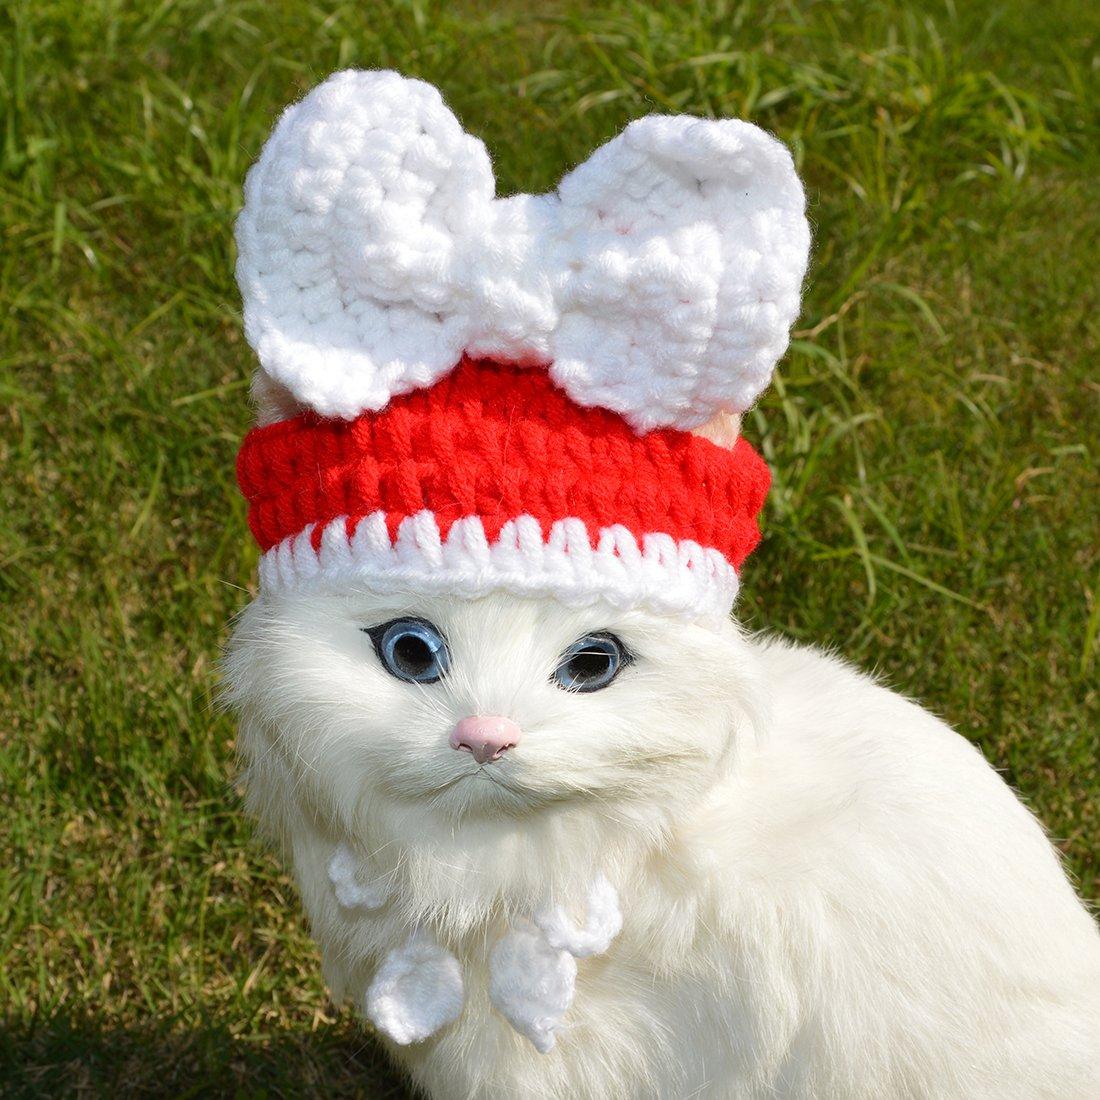 Pet Christmas Hat Cat Yarn Costume Santa Hat, Green Red Xmas Handmade Autumn Winter Warm Cute Cap Apparel for Pets Christmas Party,Small Medium